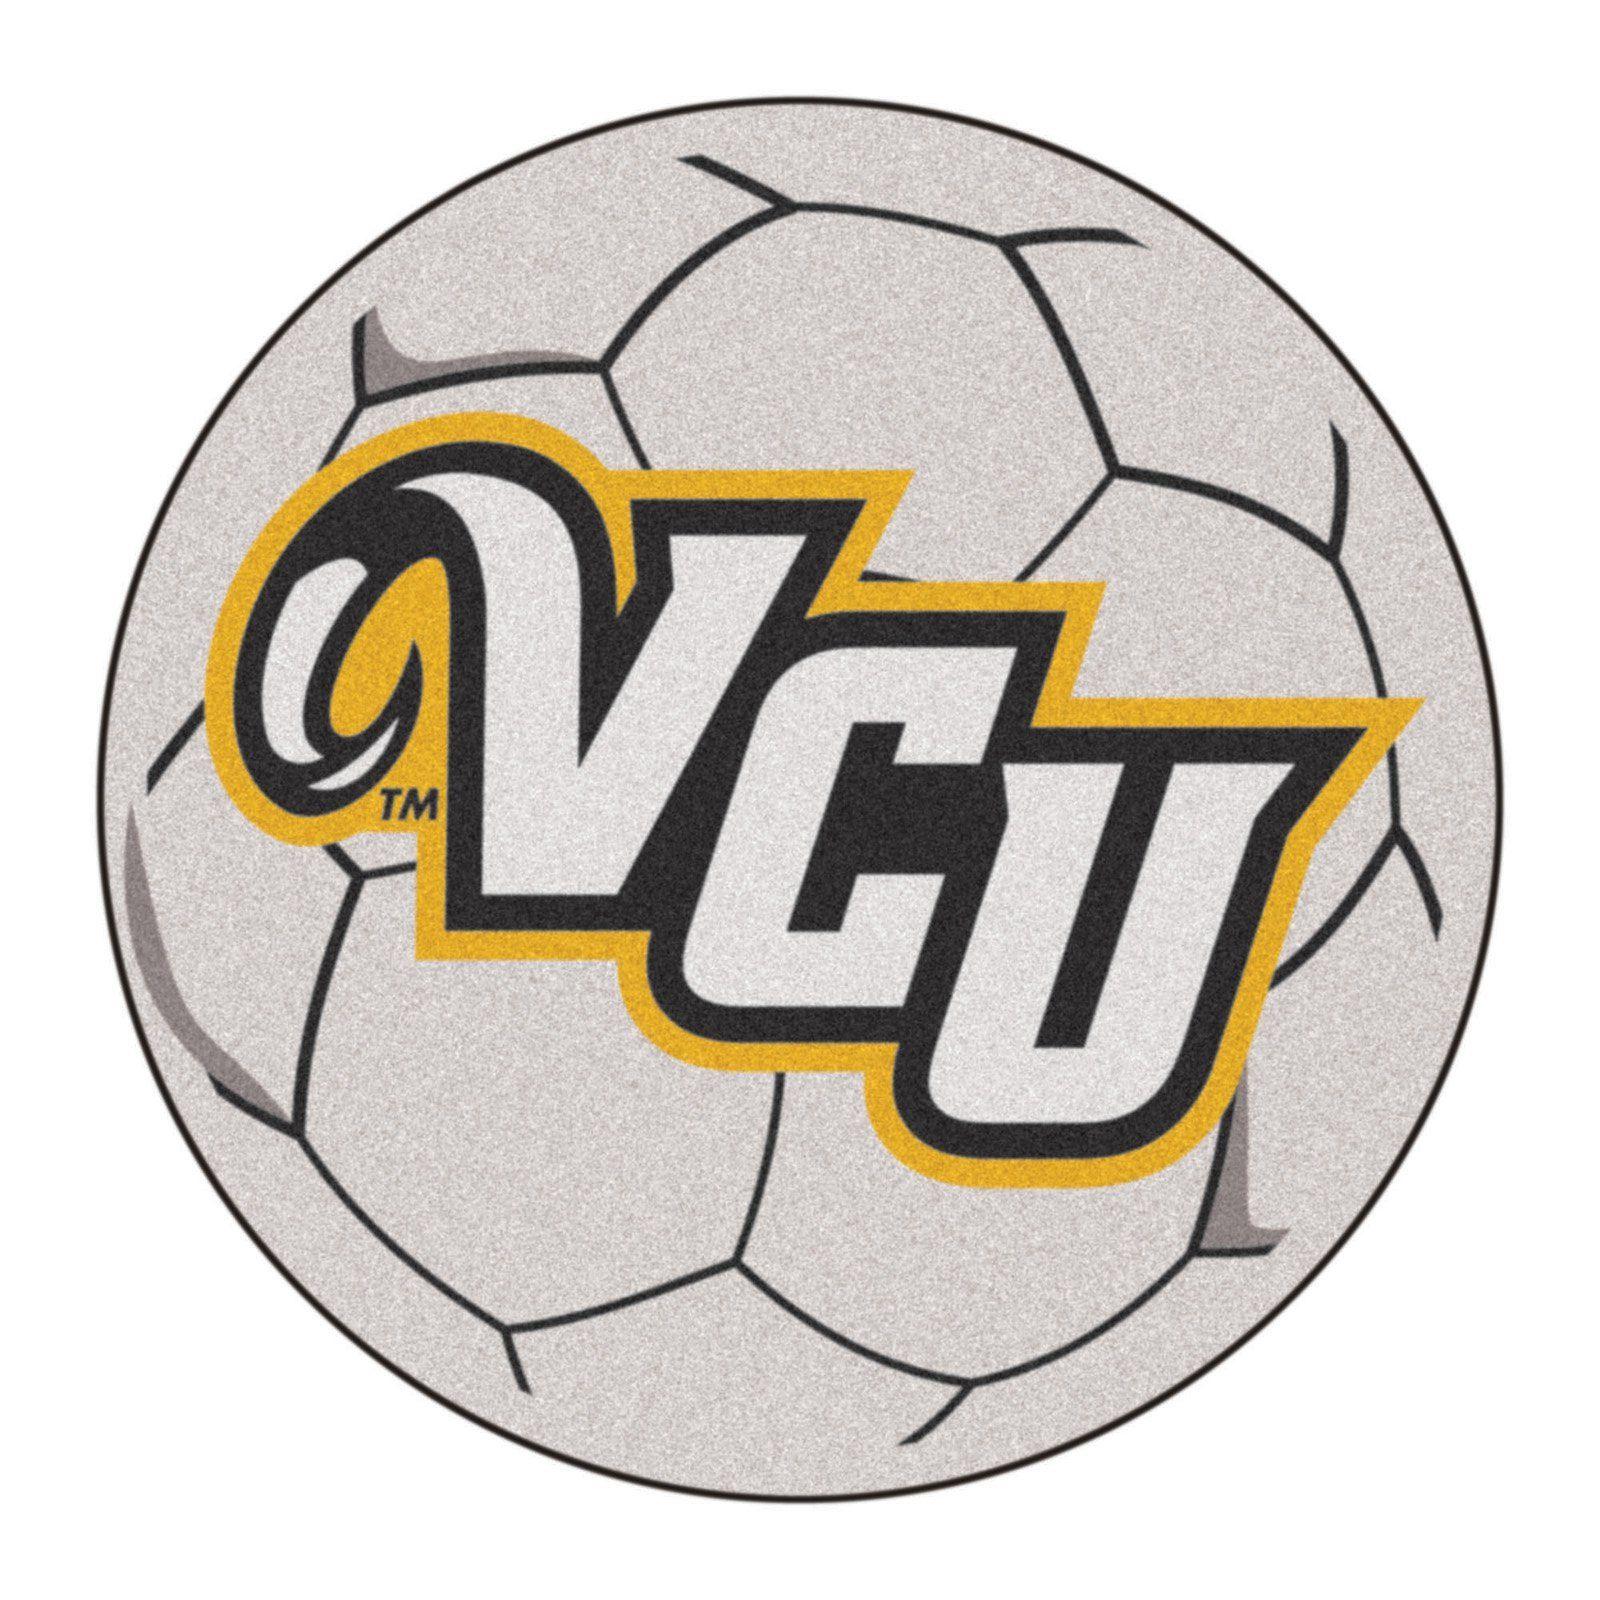 Fan Mats NCAA Collegiate Soccer Ball Rug 2.25 diam. ft